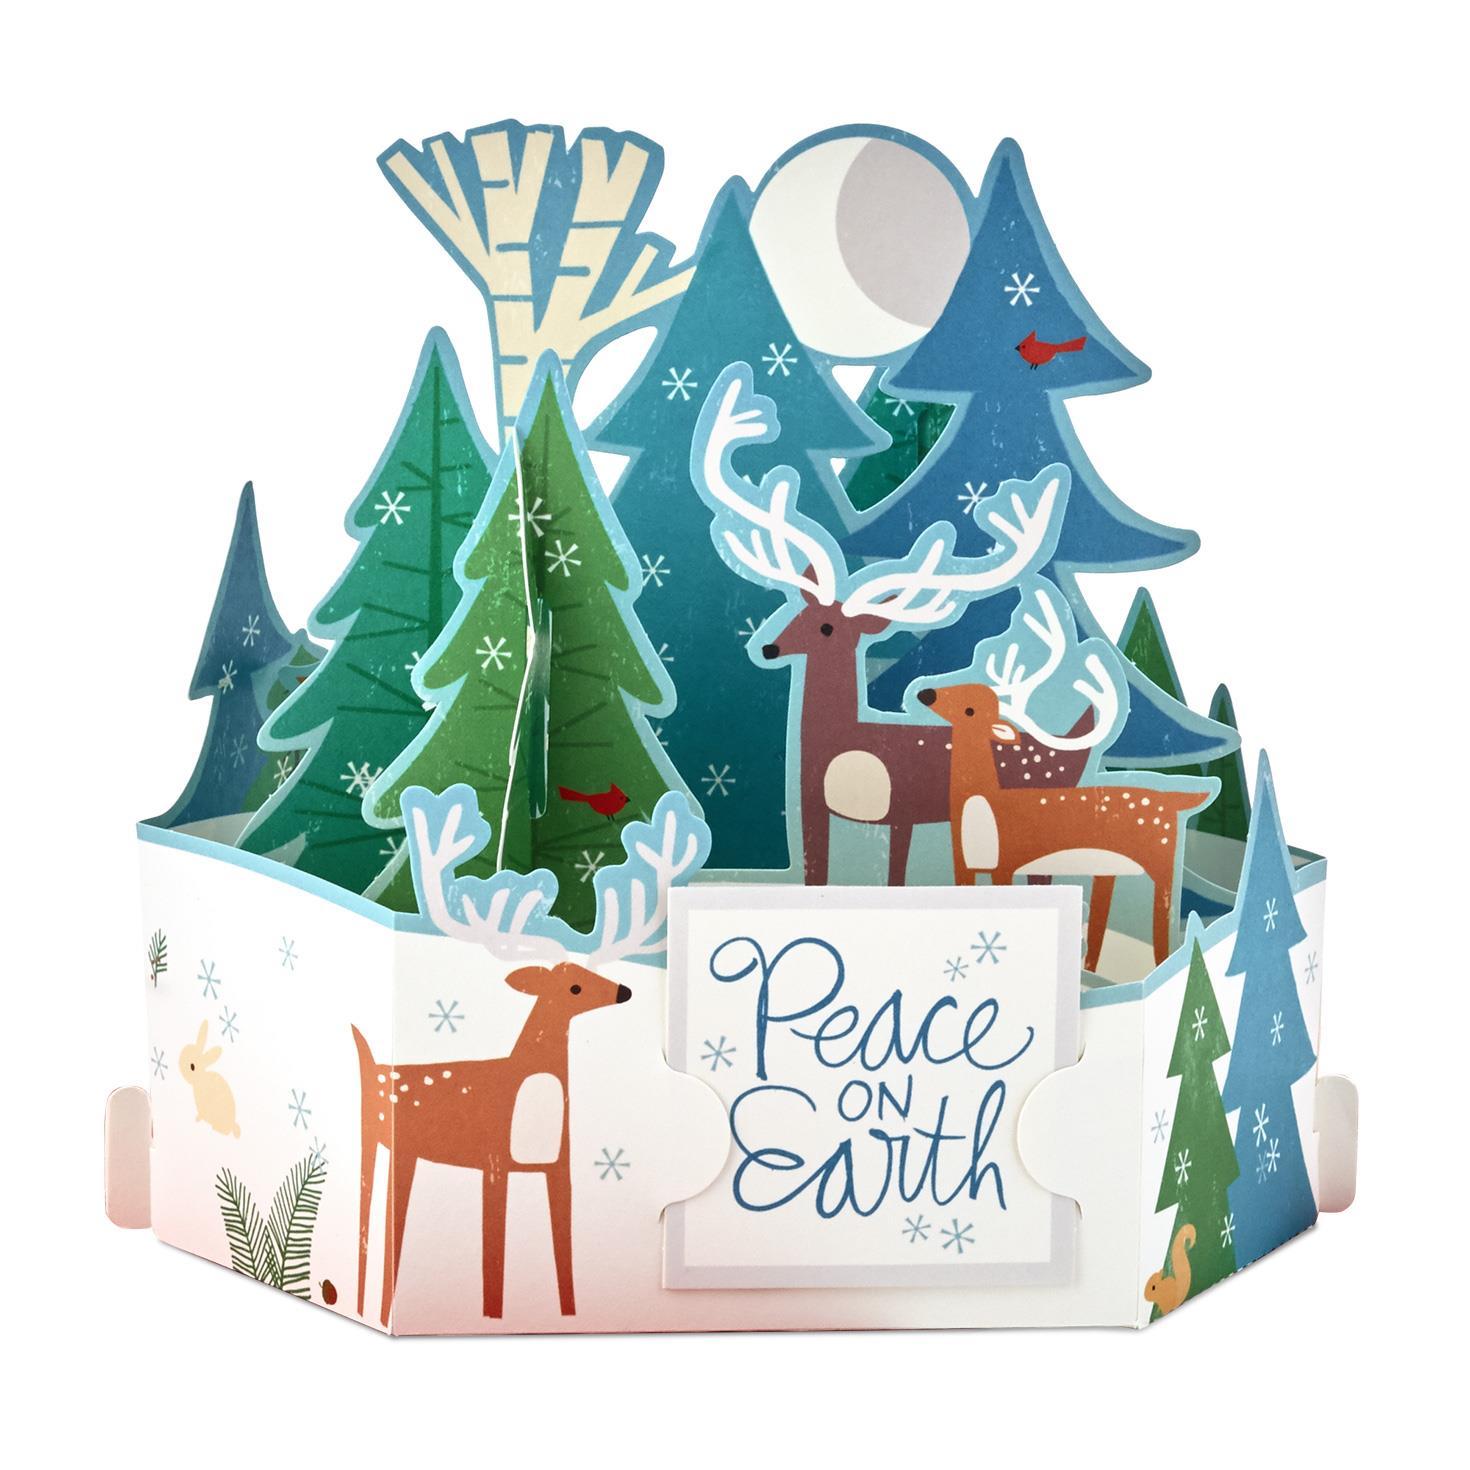 Moonlit Reindeer Scene Pop Up Christmas Card - Greeting Cards - Hallmark